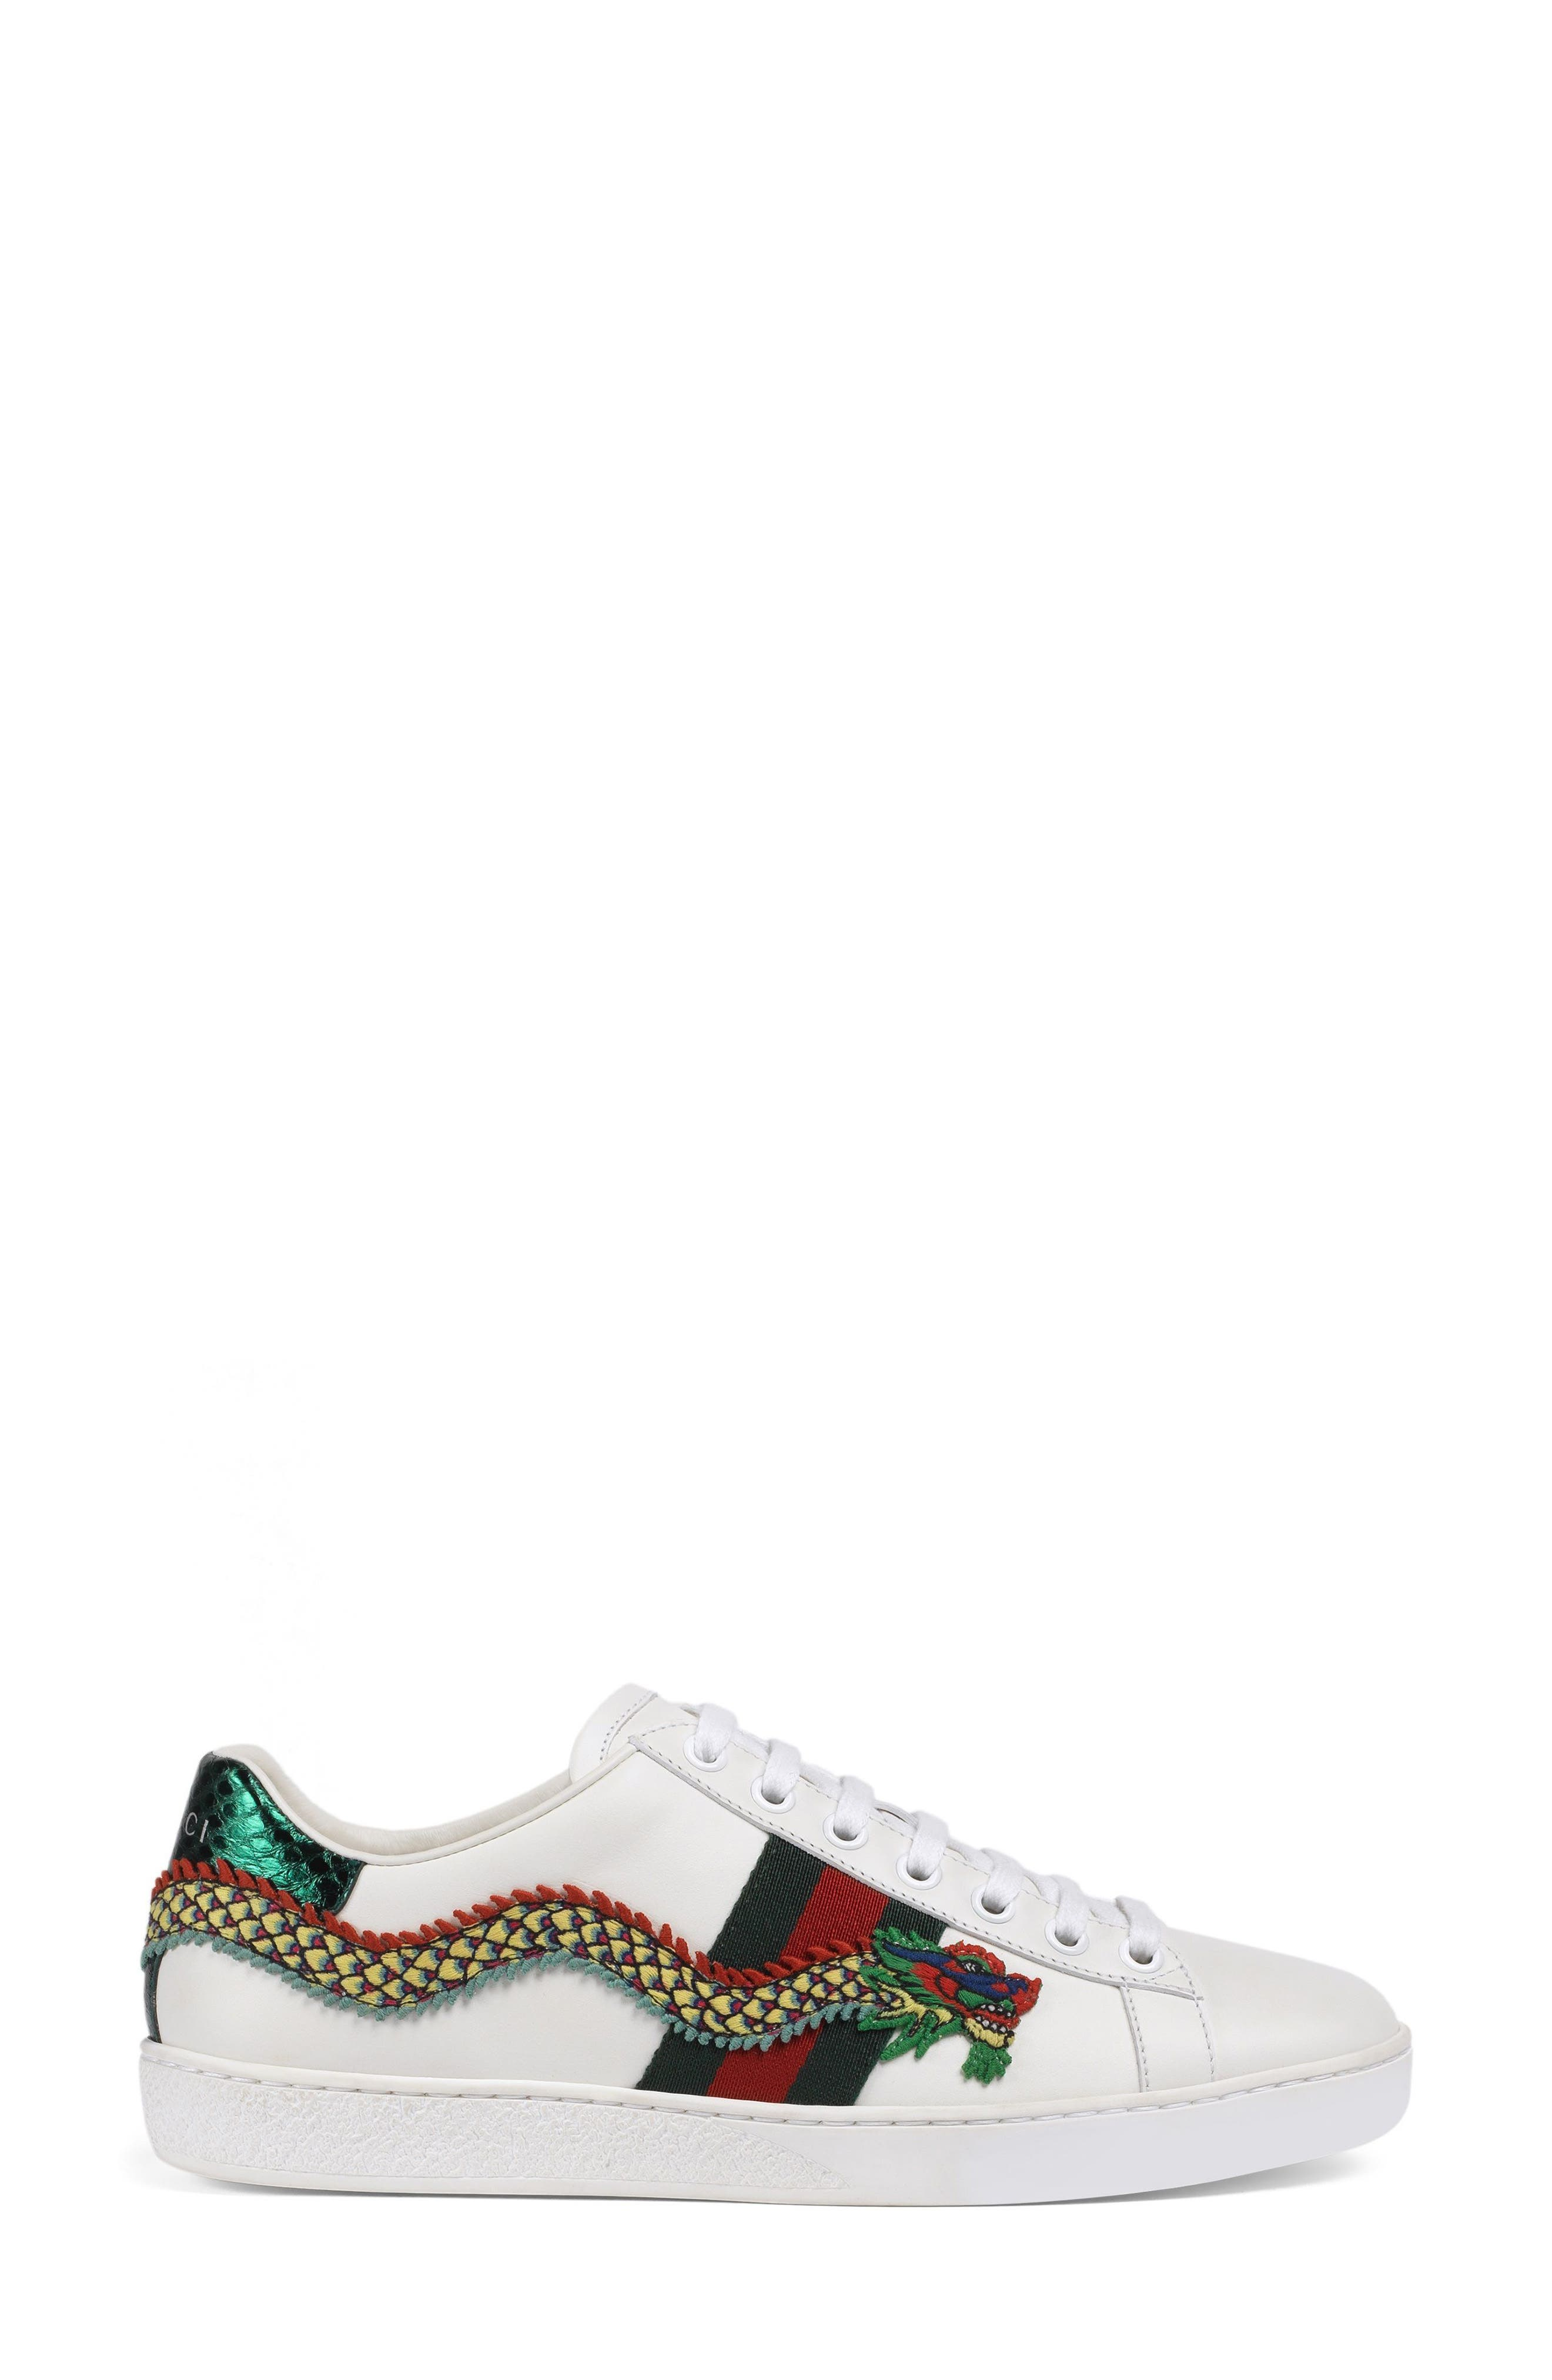 gucci tennis shoes. main image - gucci new ace dragon sneaker (women) tennis shoes